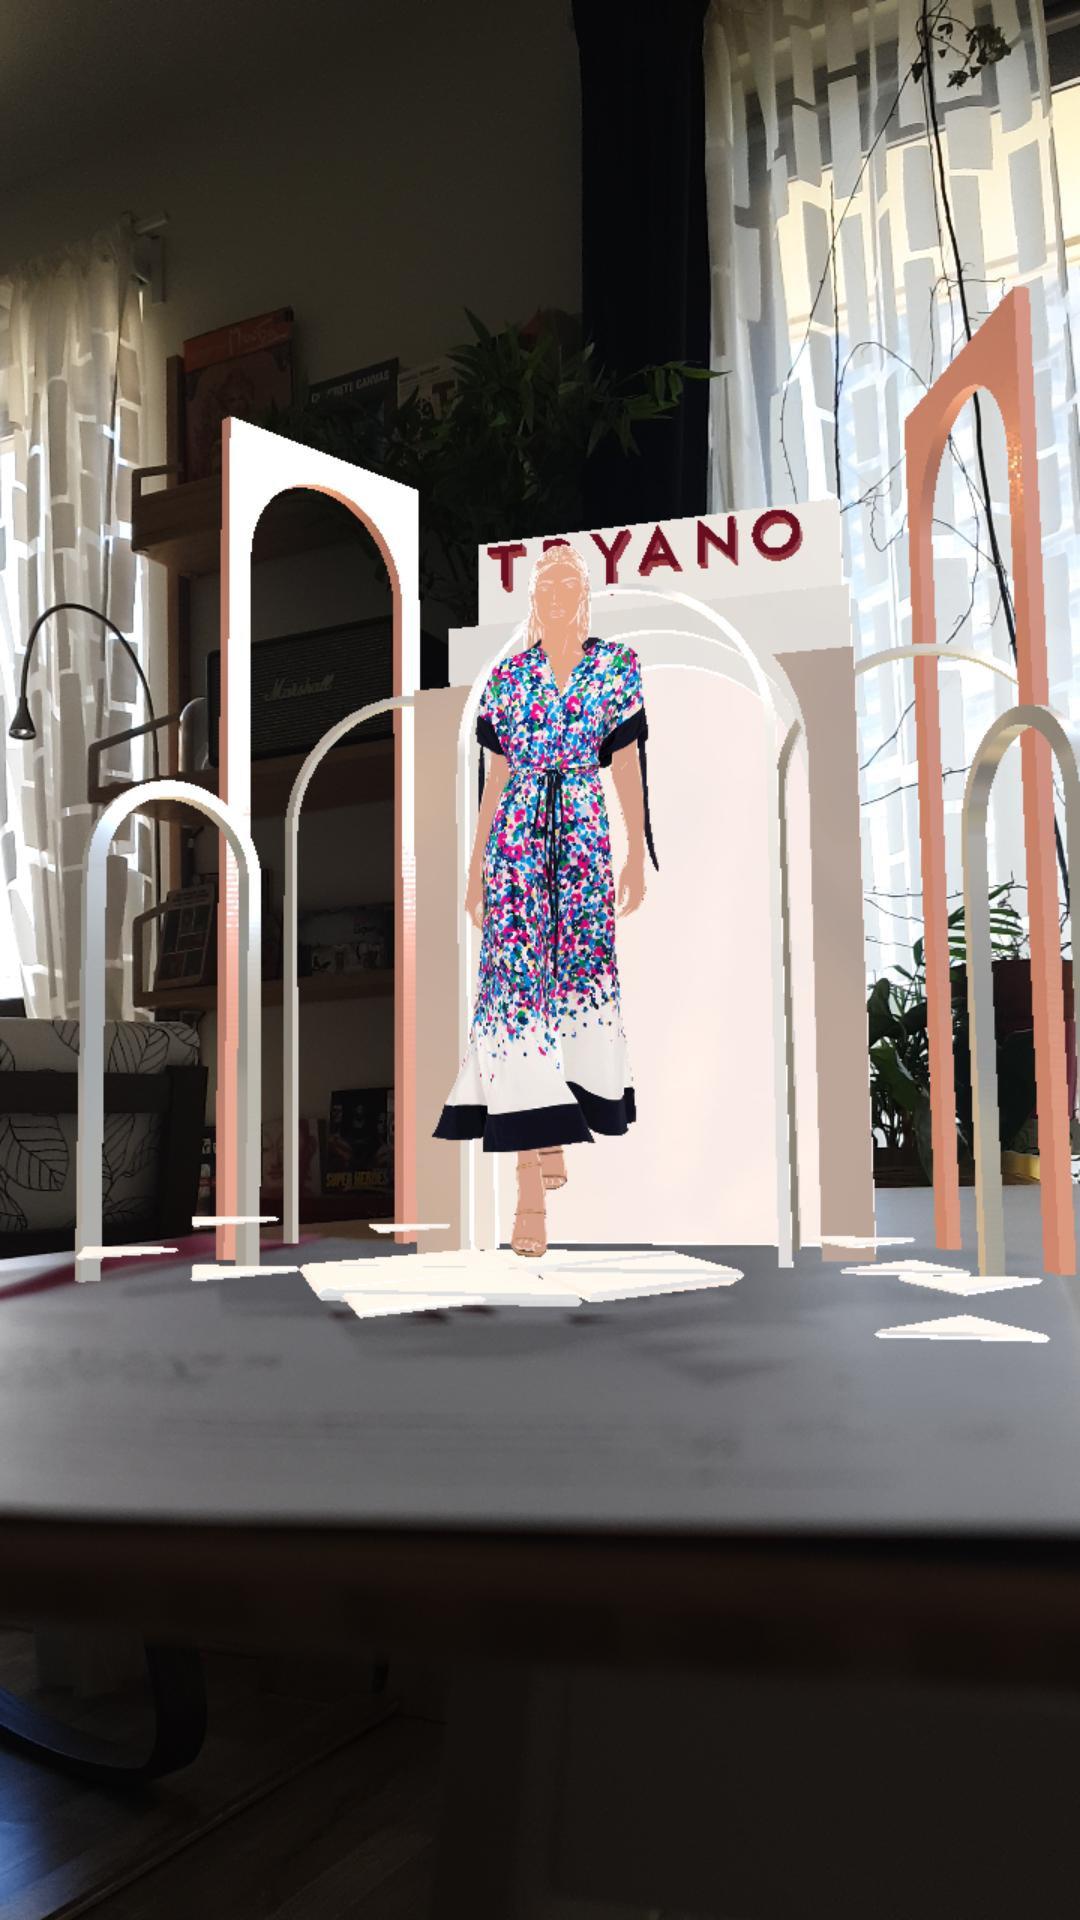 #StudioMrWhite #animation #AR filter #fashion #Augmented Reality #motiongraphics #art #instagram #design #augmented #Reality #Filters #face filters #digitalart #motiondesign #creative #2D #Tryano # Chalhoub Group #Digital Marketing #virtual #promotion